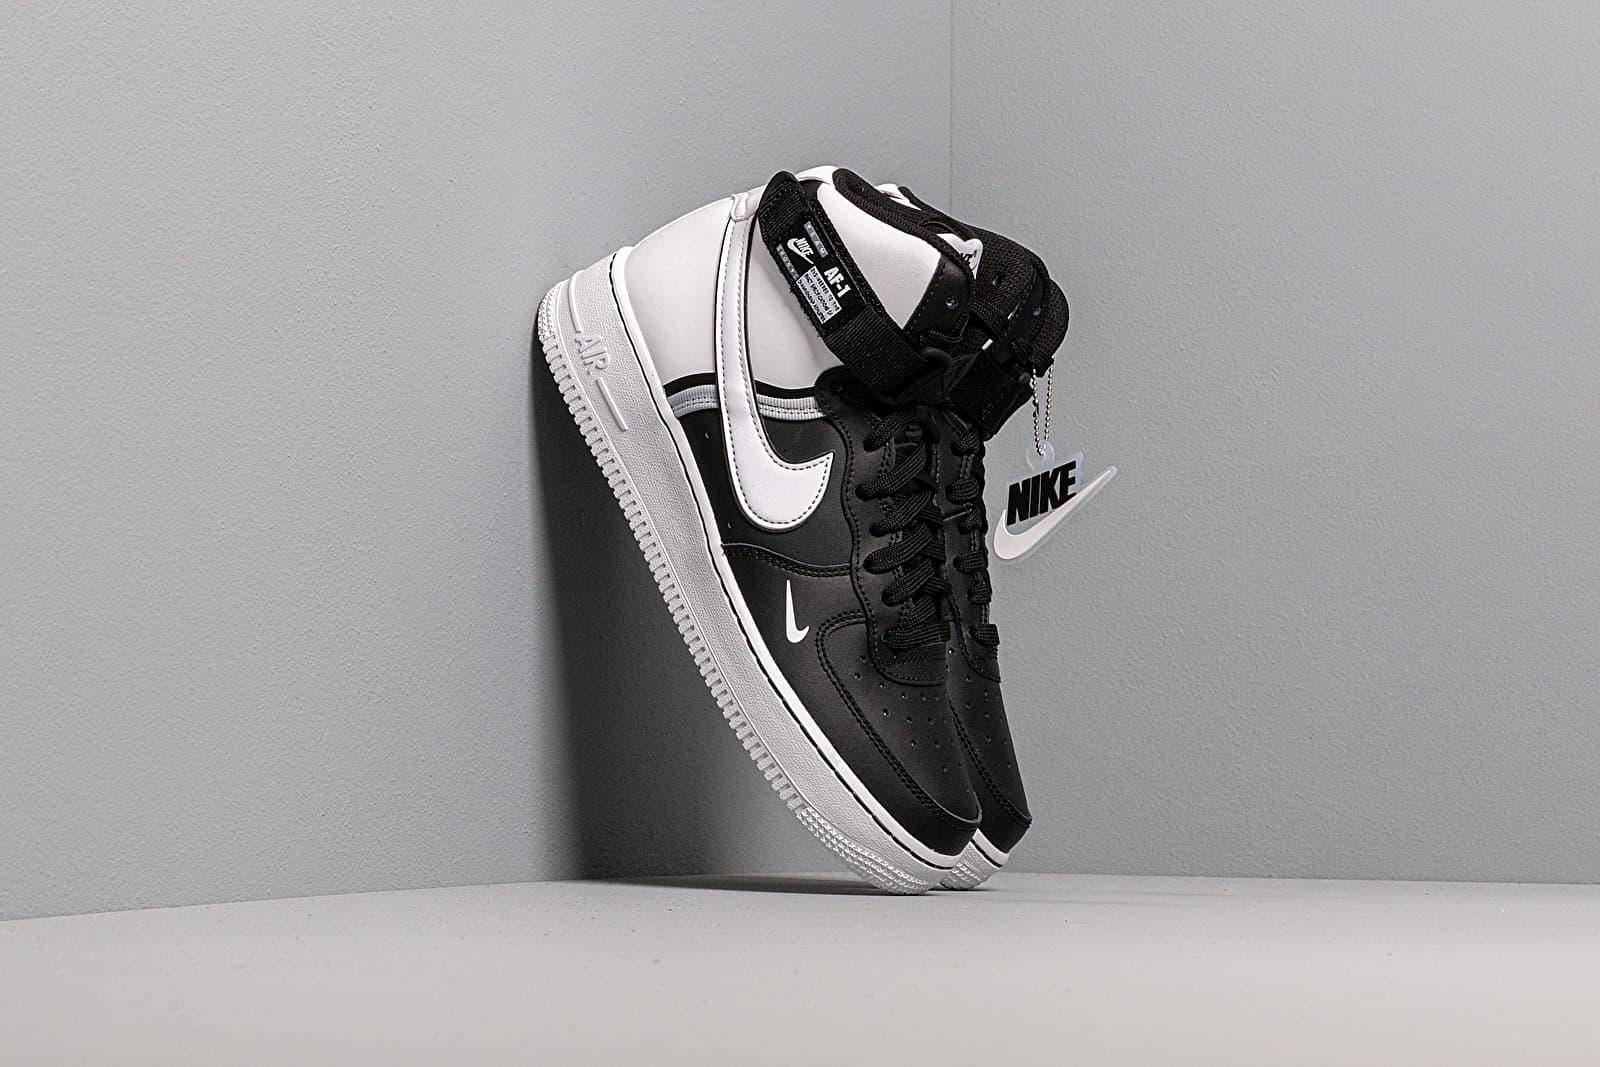 Nike Air Force 1 High Lv8 2 (GS) Black White Wolf Grey White | Footshop